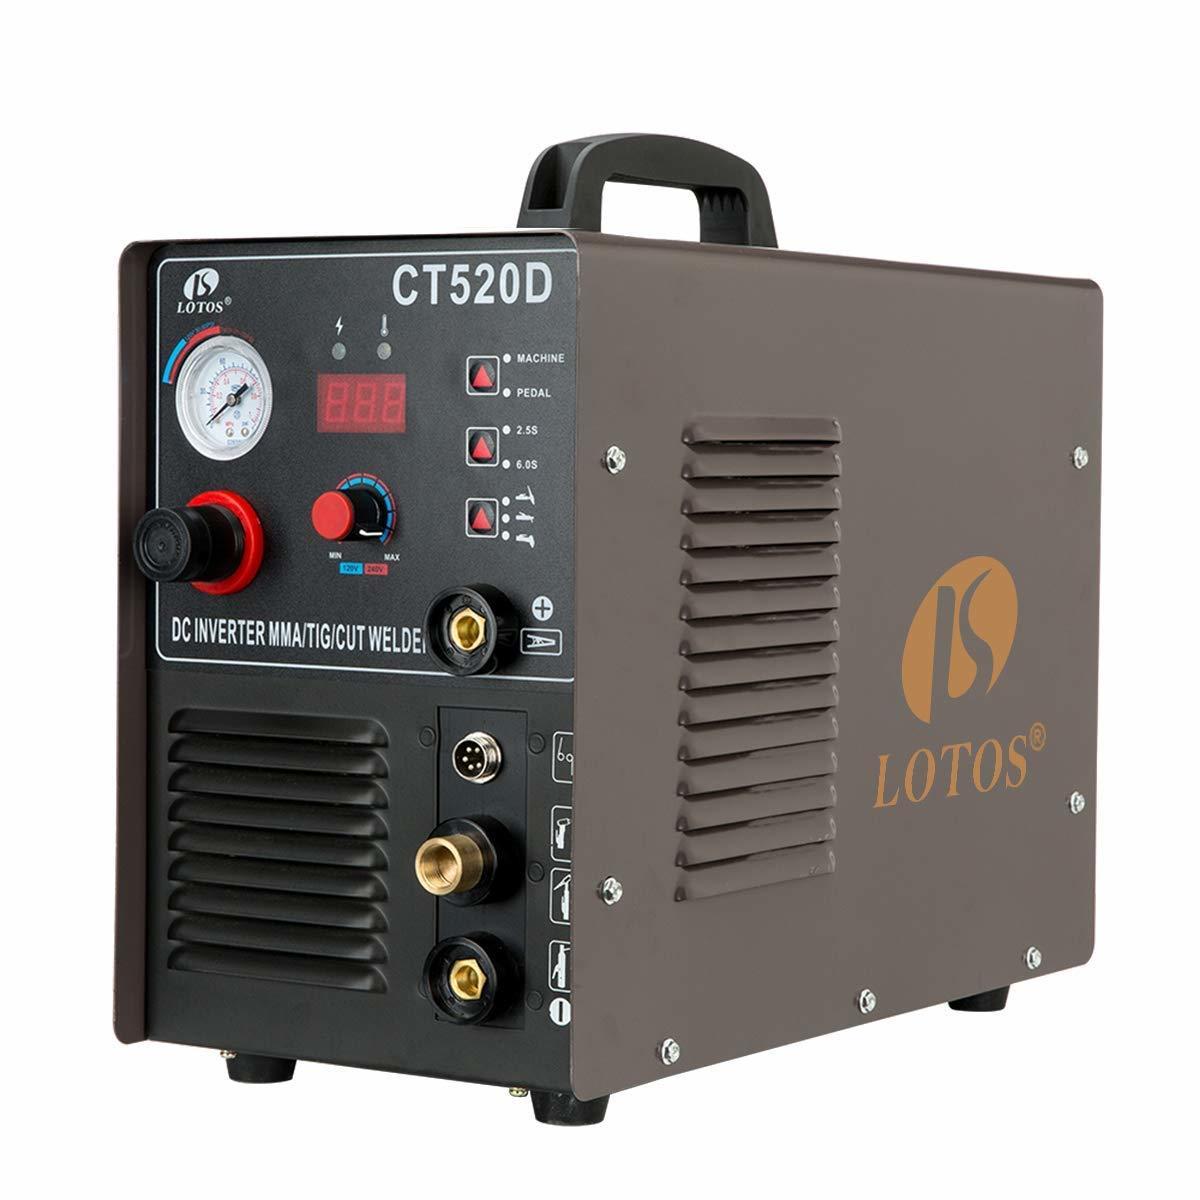 Lotos CT520D 50 AMP Stick Welder